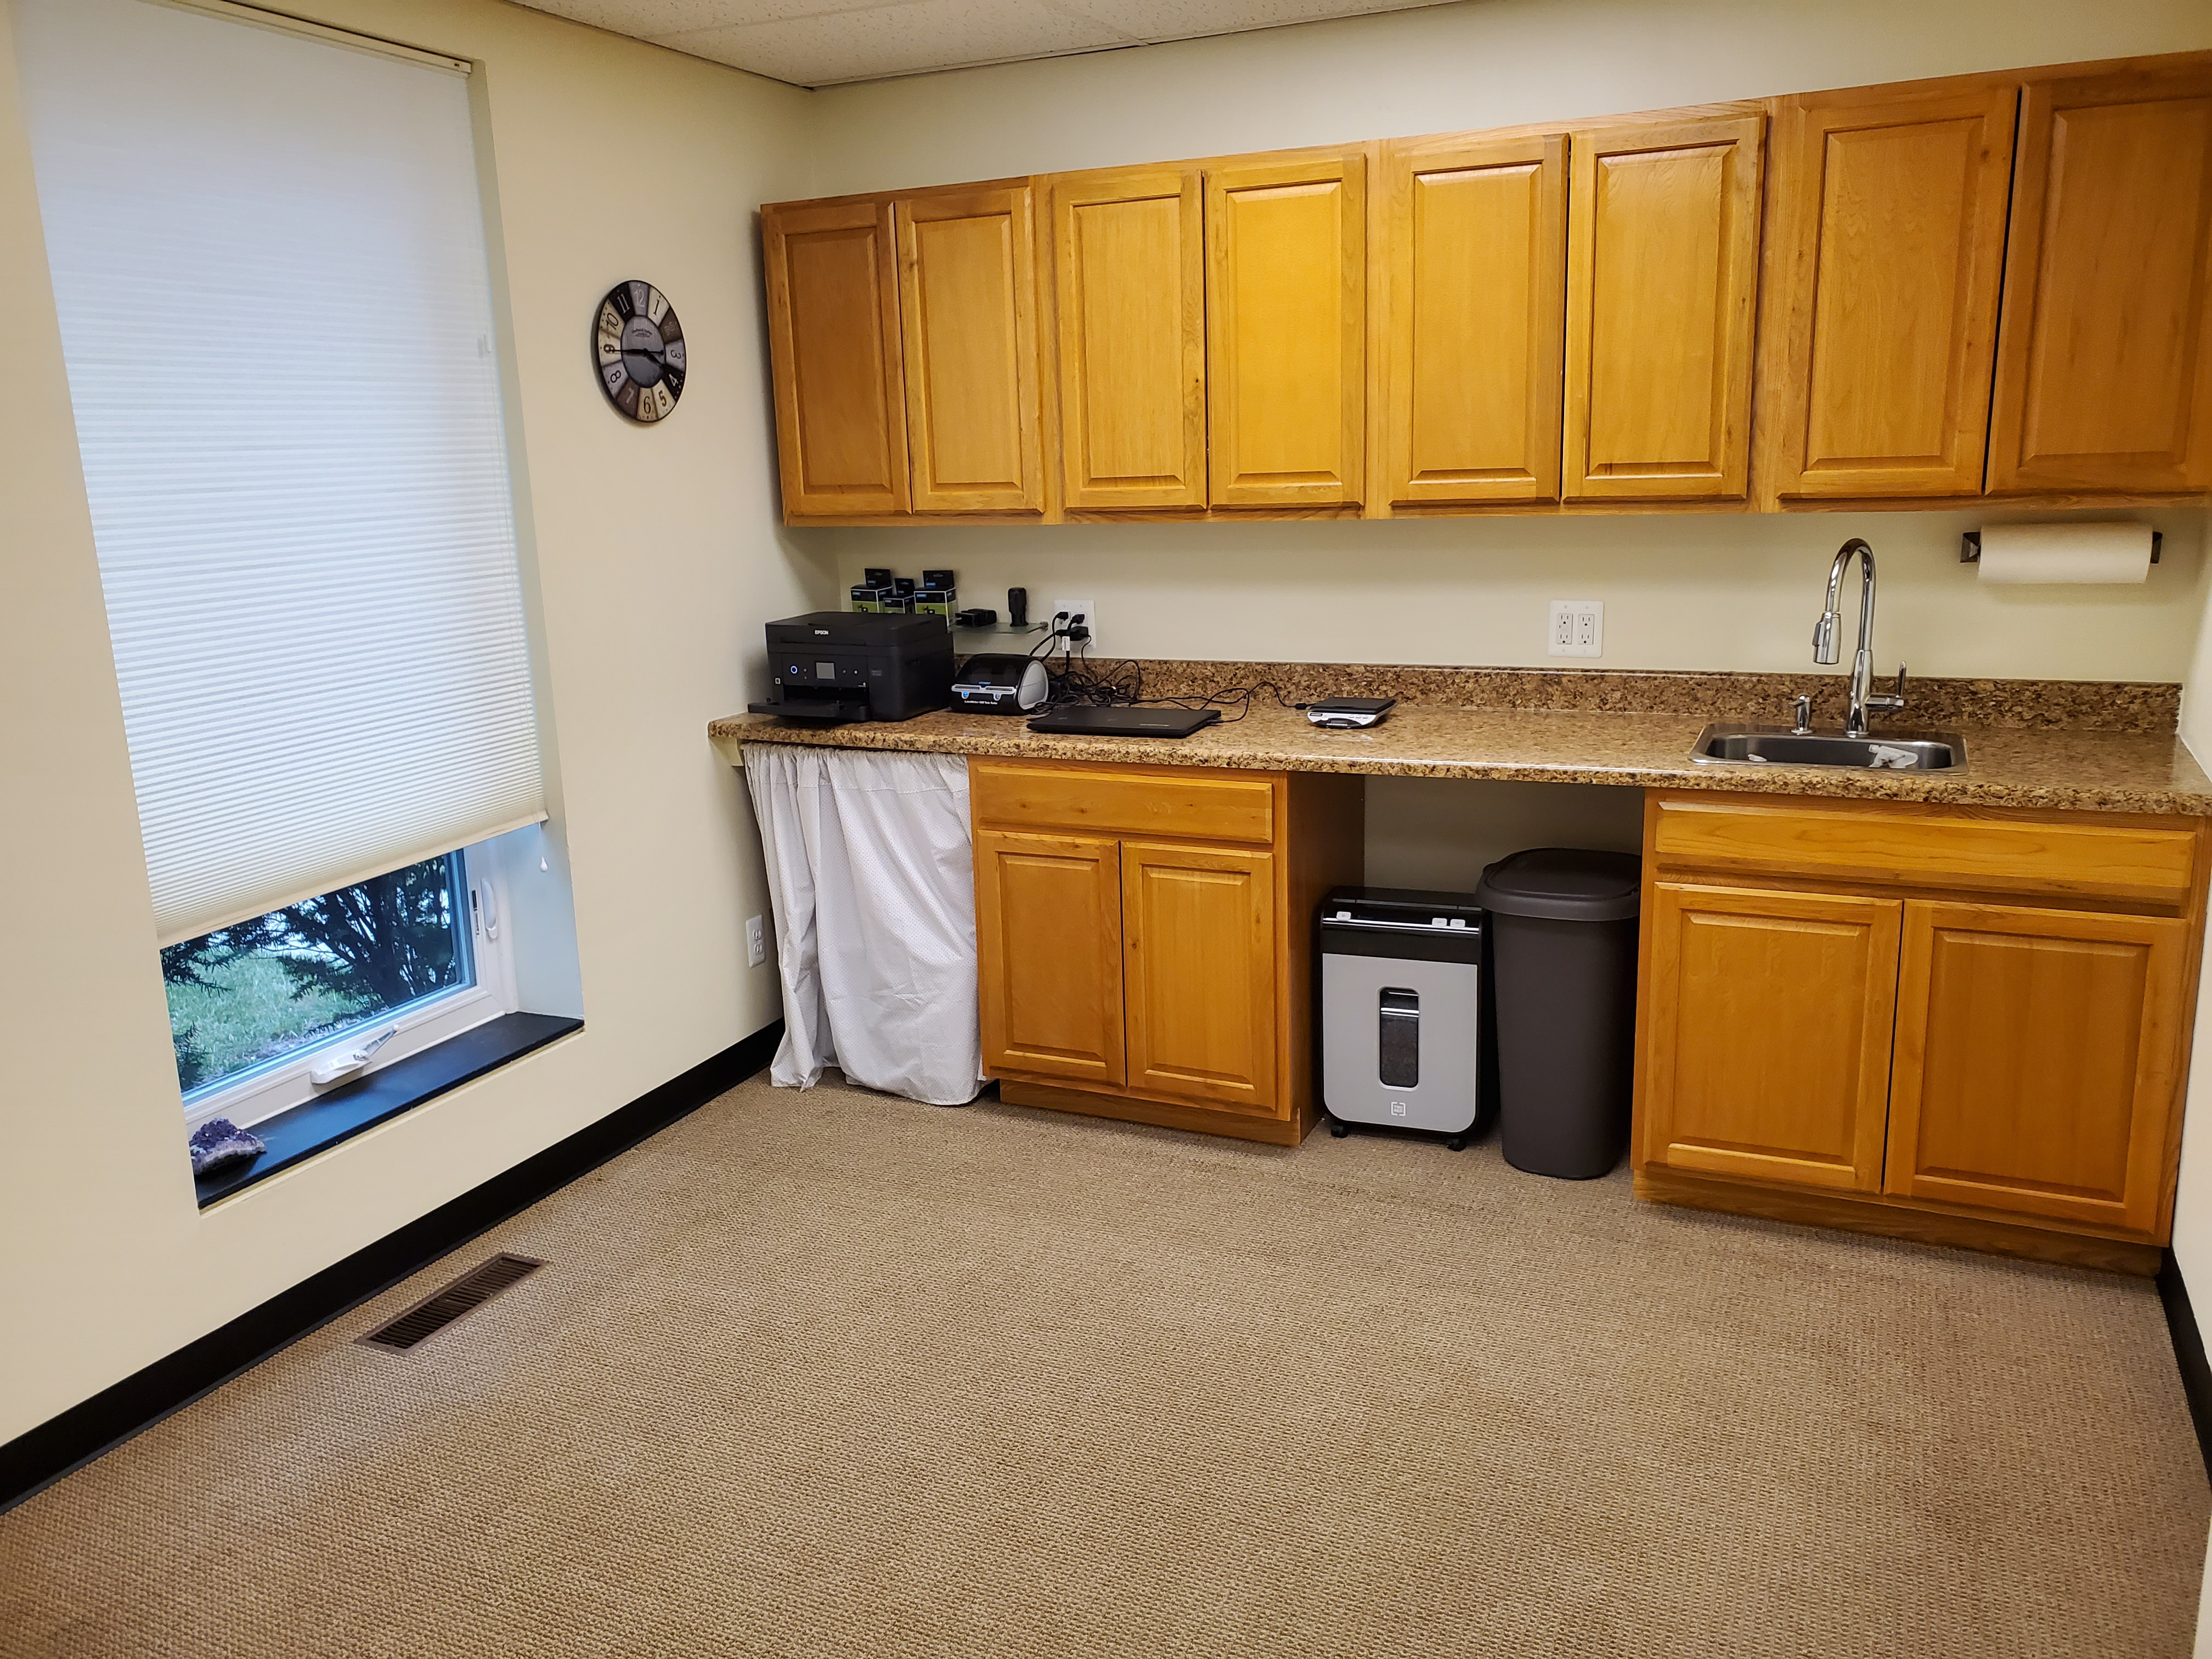 230 Collingwood Street, Suite 150 Ann Arbor, MI 48103